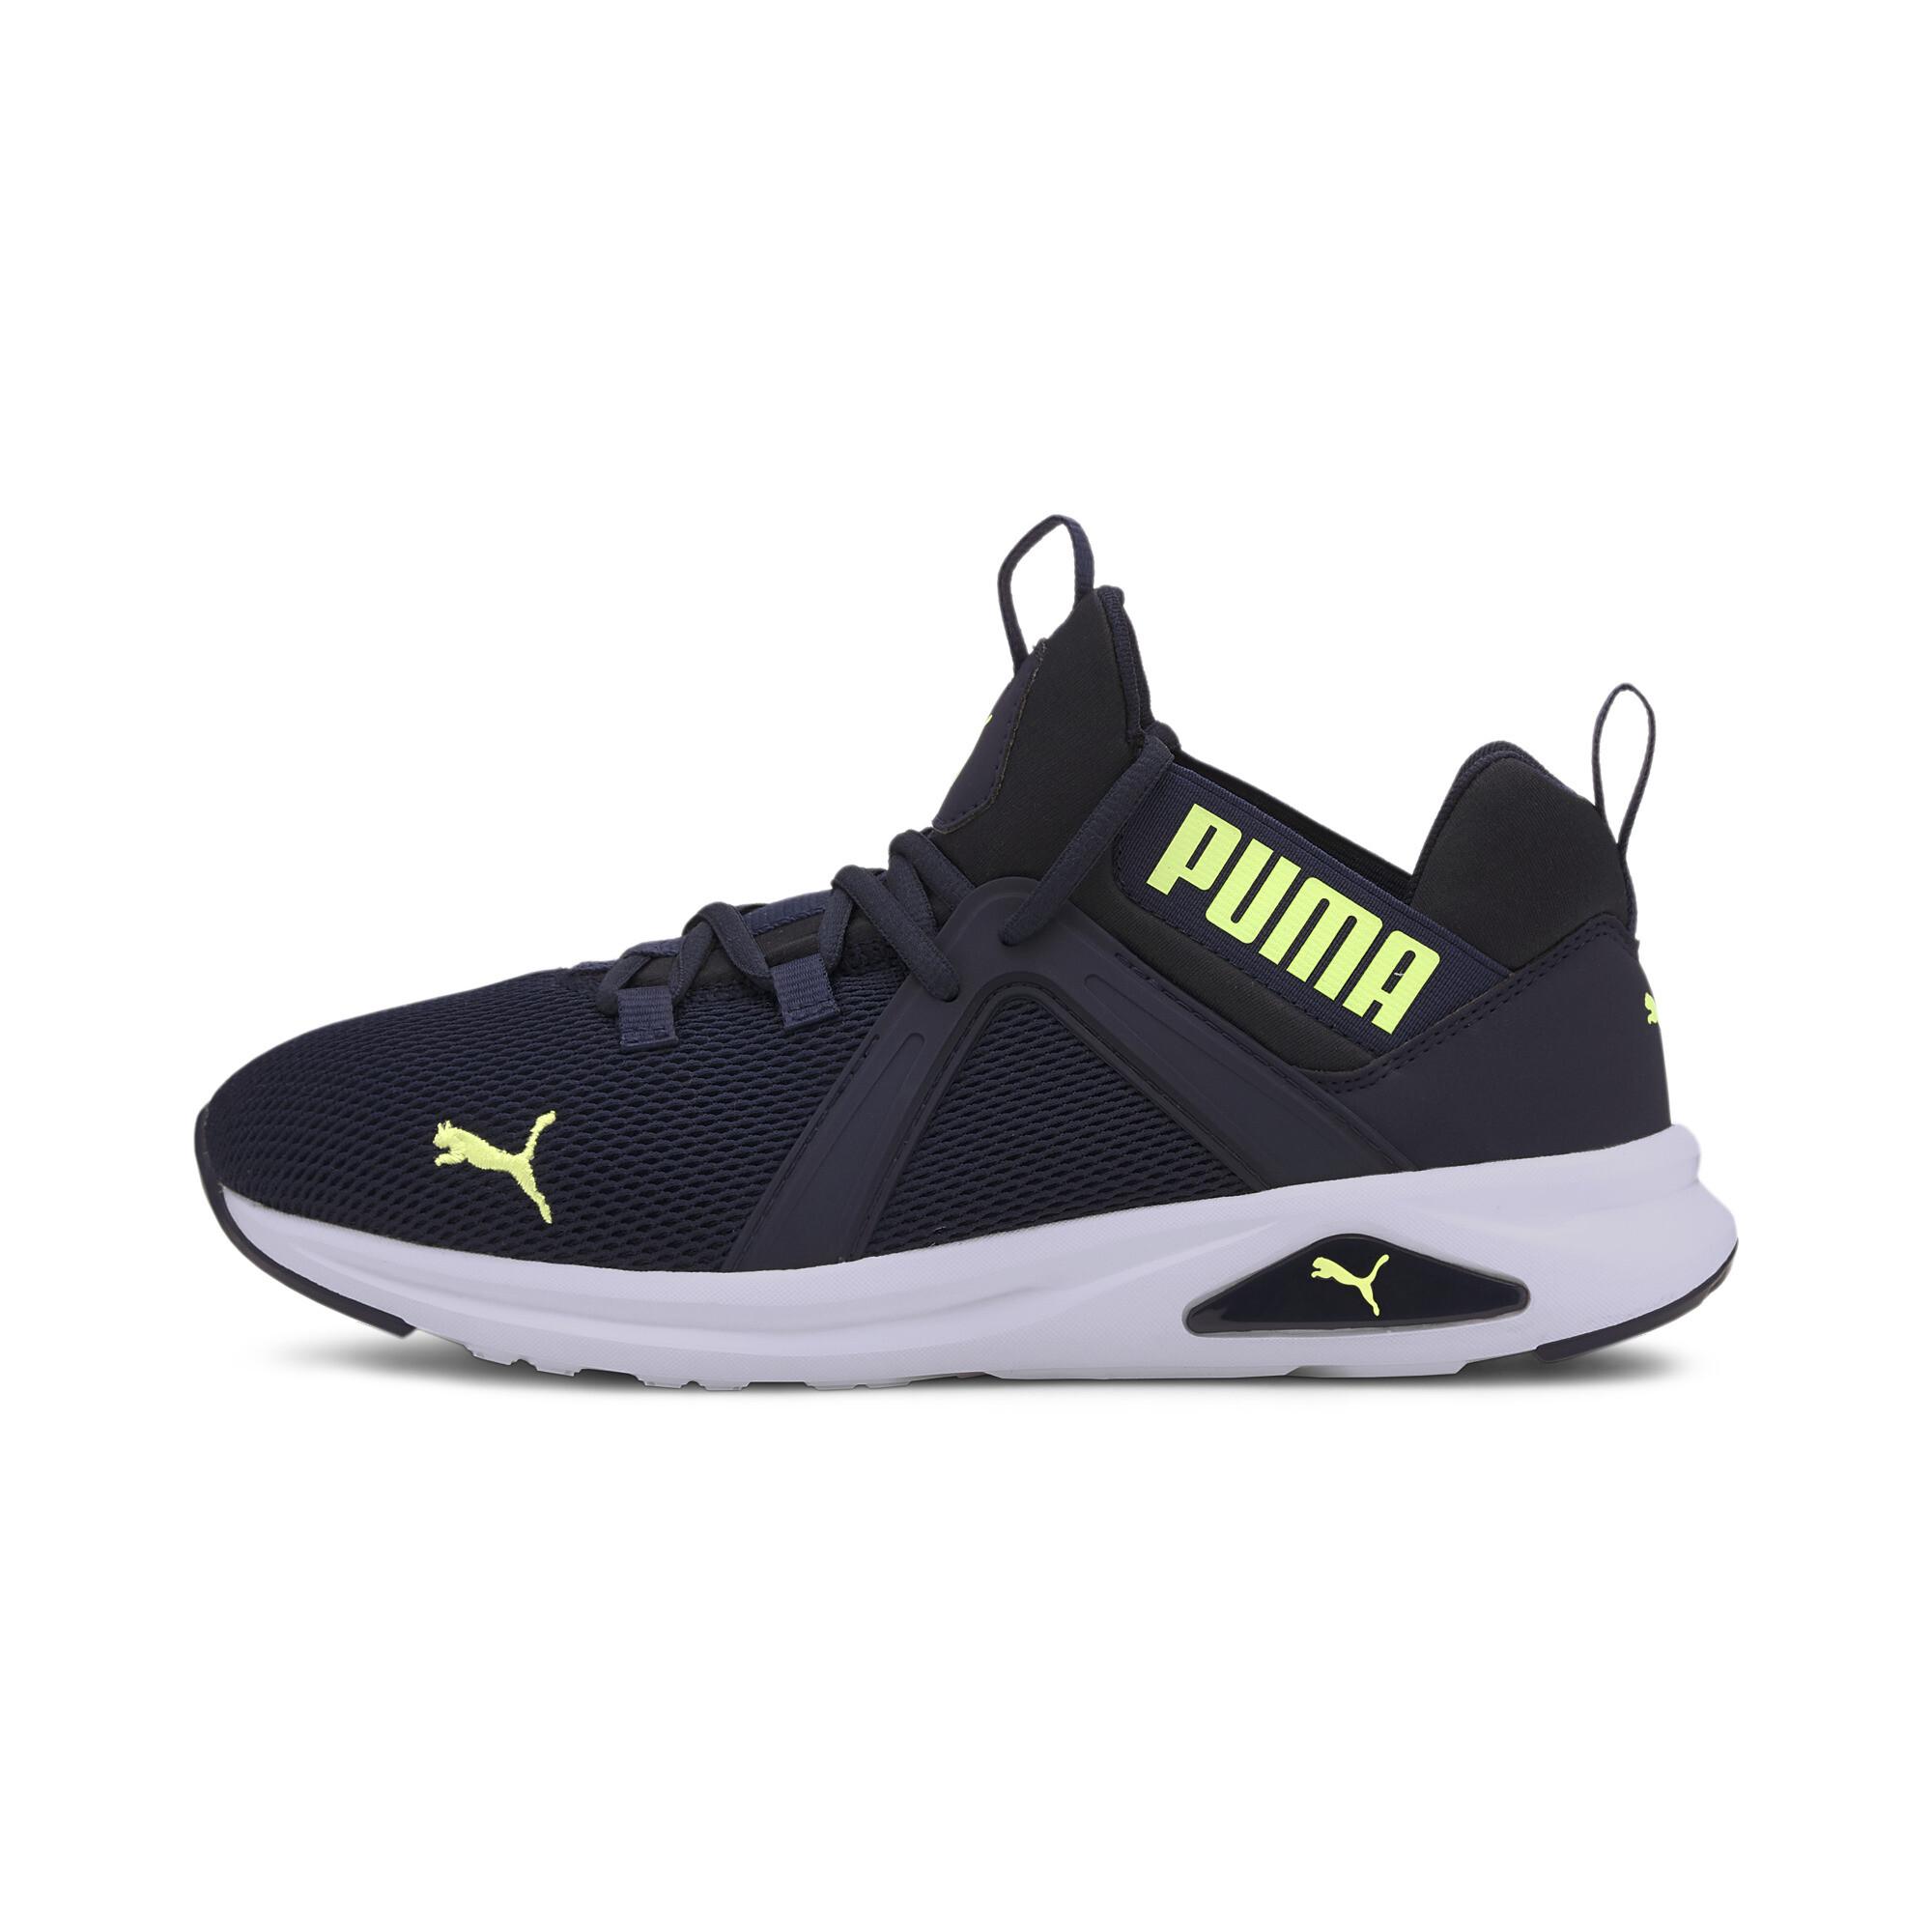 PUMA-Men-039-s-Enzo-2-Training-Shoes thumbnail 23